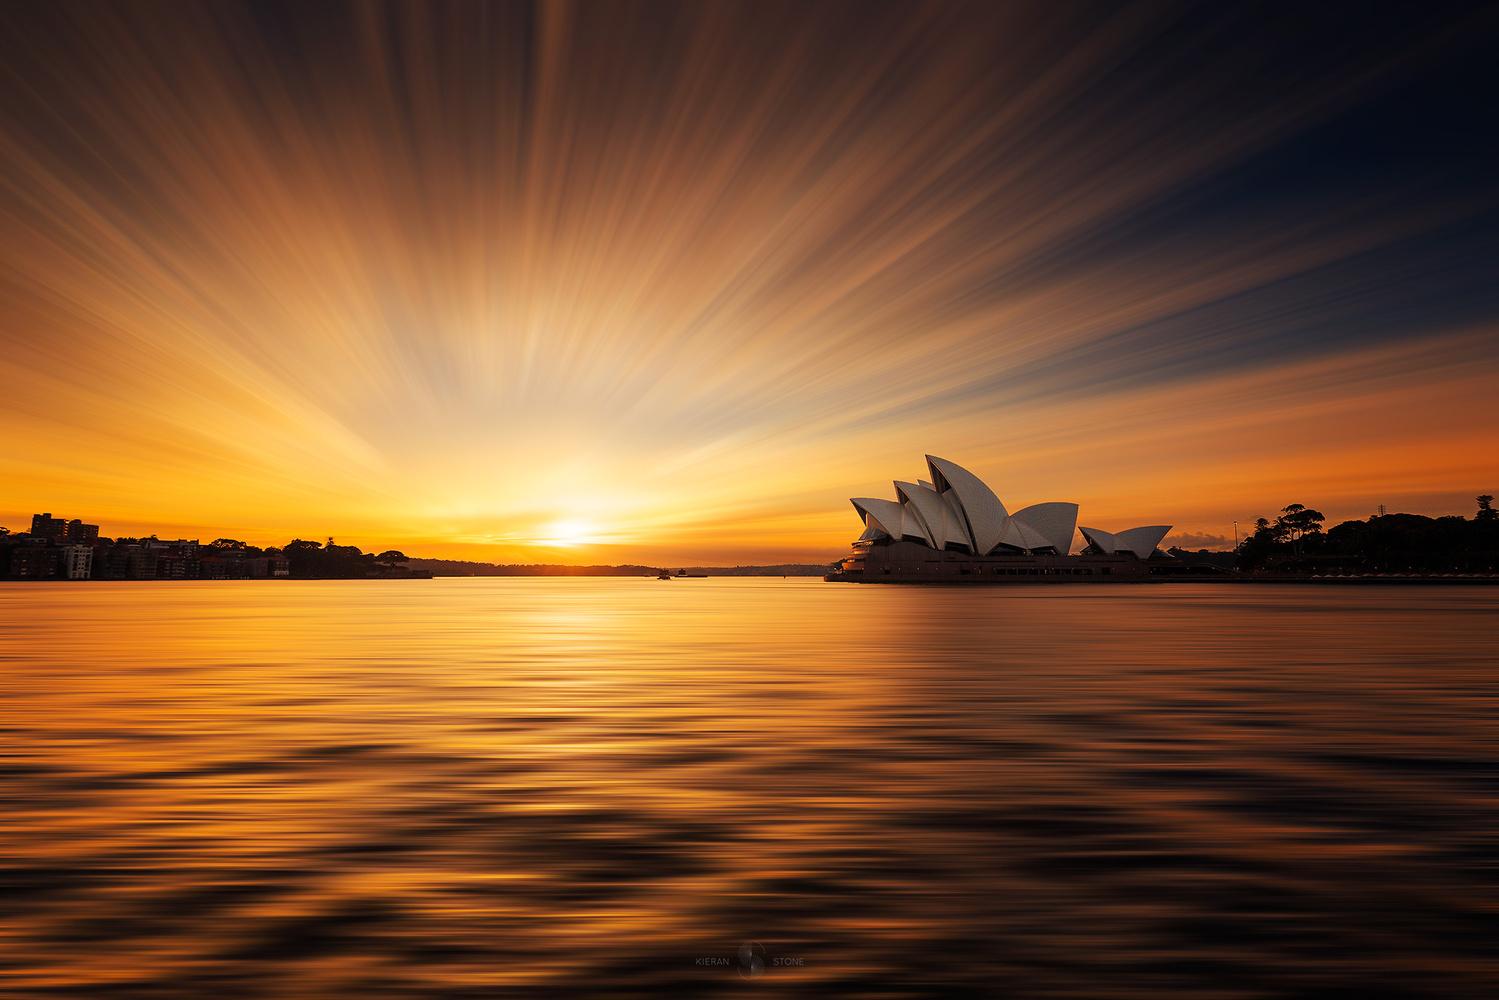 Sydney Sunrise by Kieran Stone